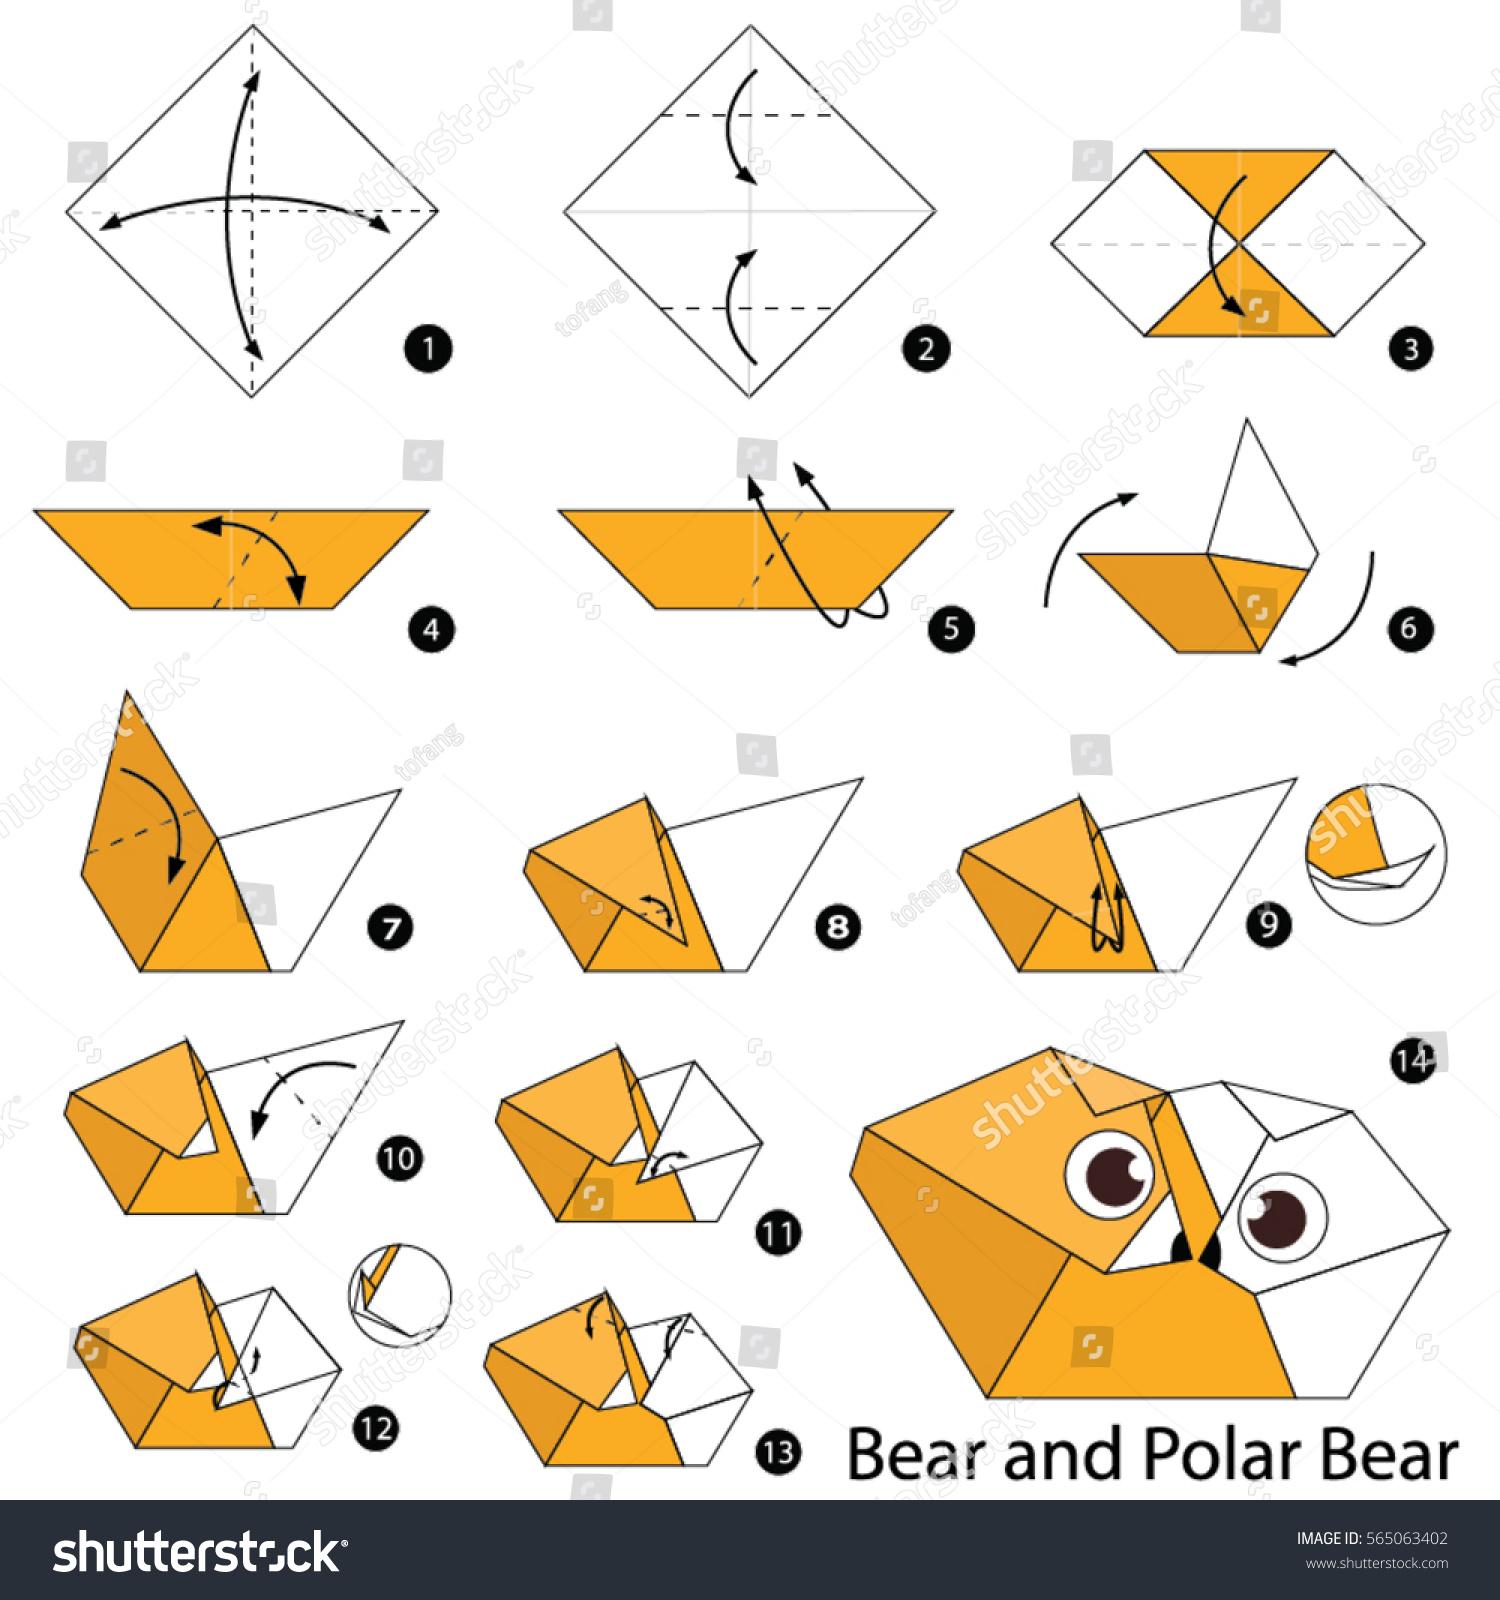 Easy Origami Bear - Panda Bear - Polar Bear - Brown Bear - Red Ted ... | 1600x1500